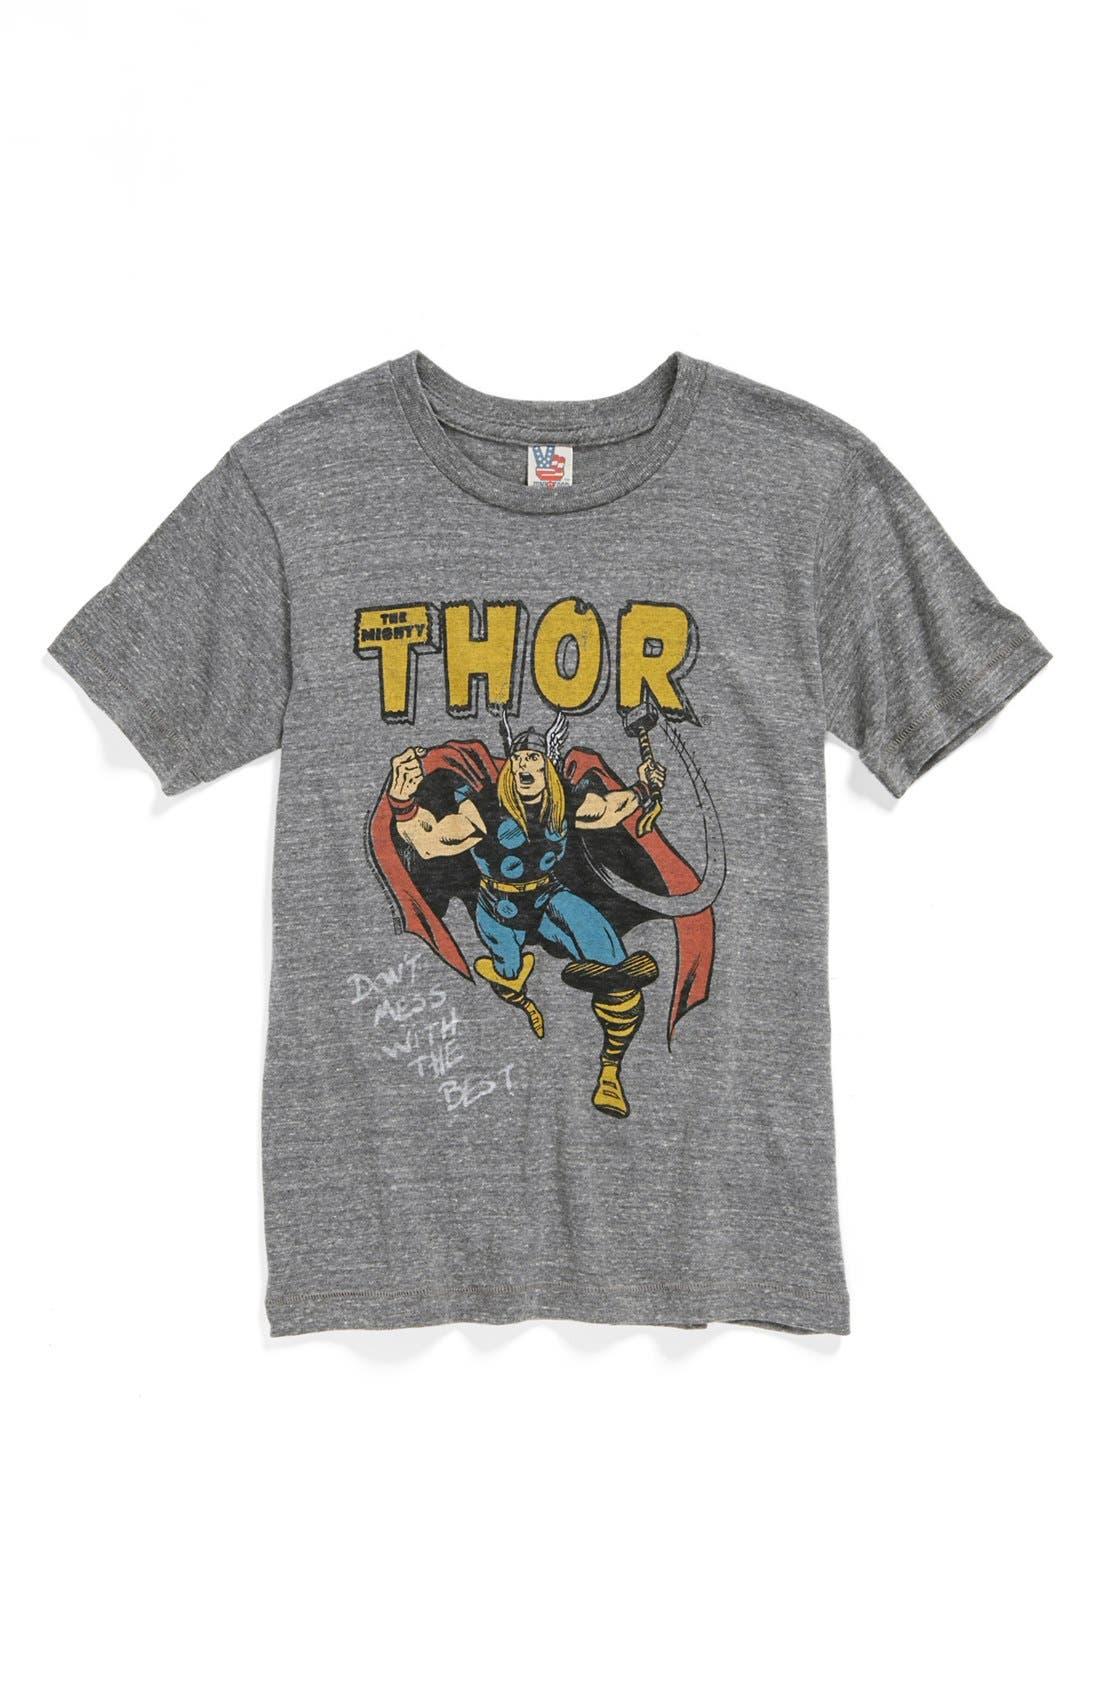 Alternate Image 1 Selected - Junk Food 'Thor' T-Shirt (Toddler Boys, Little Boys & Big Boys)